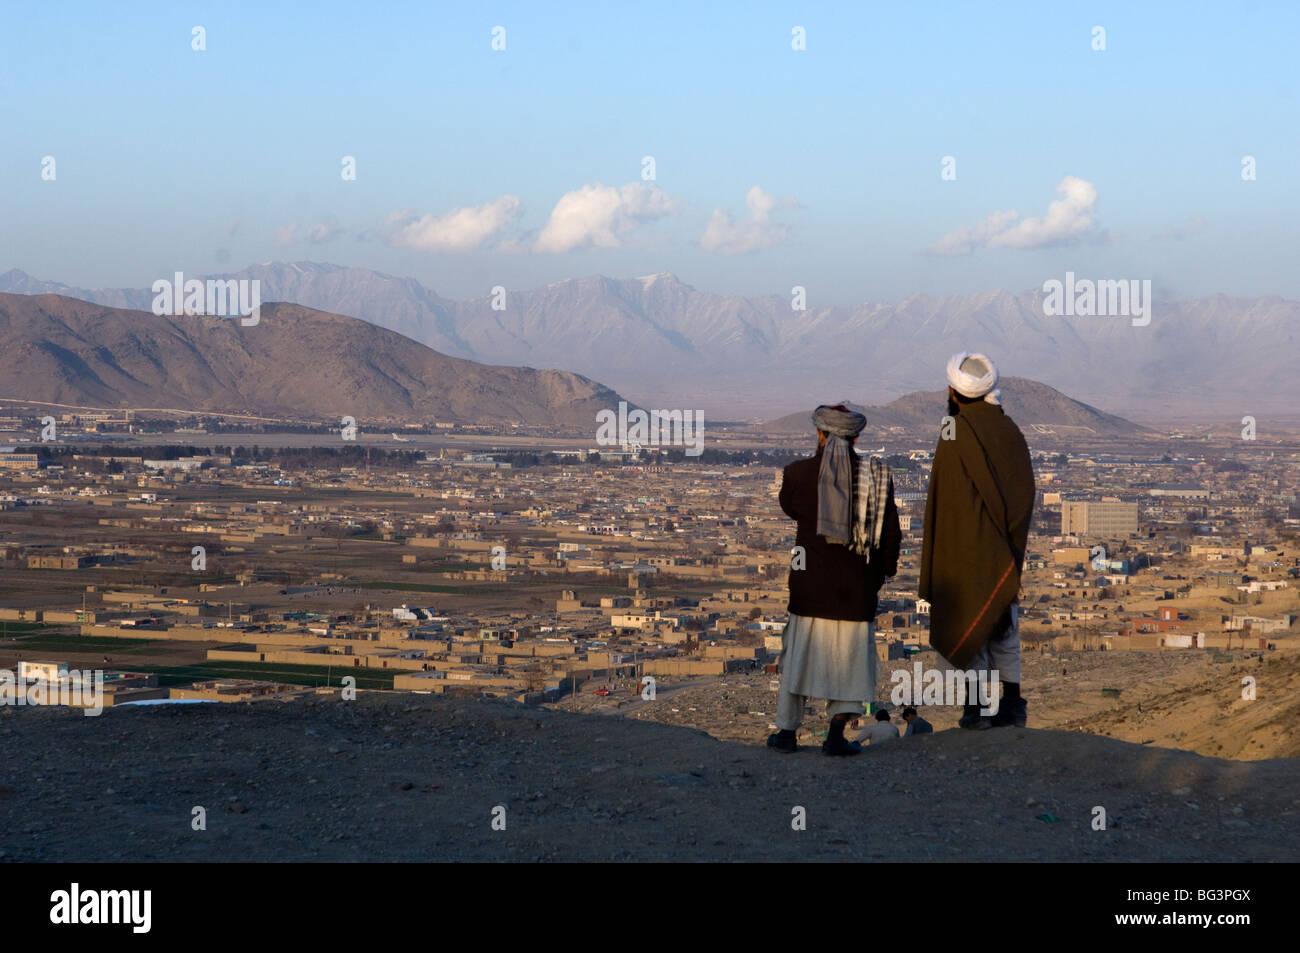 Afghan men look toward Kabul city, Afghanistan. - Stock Image